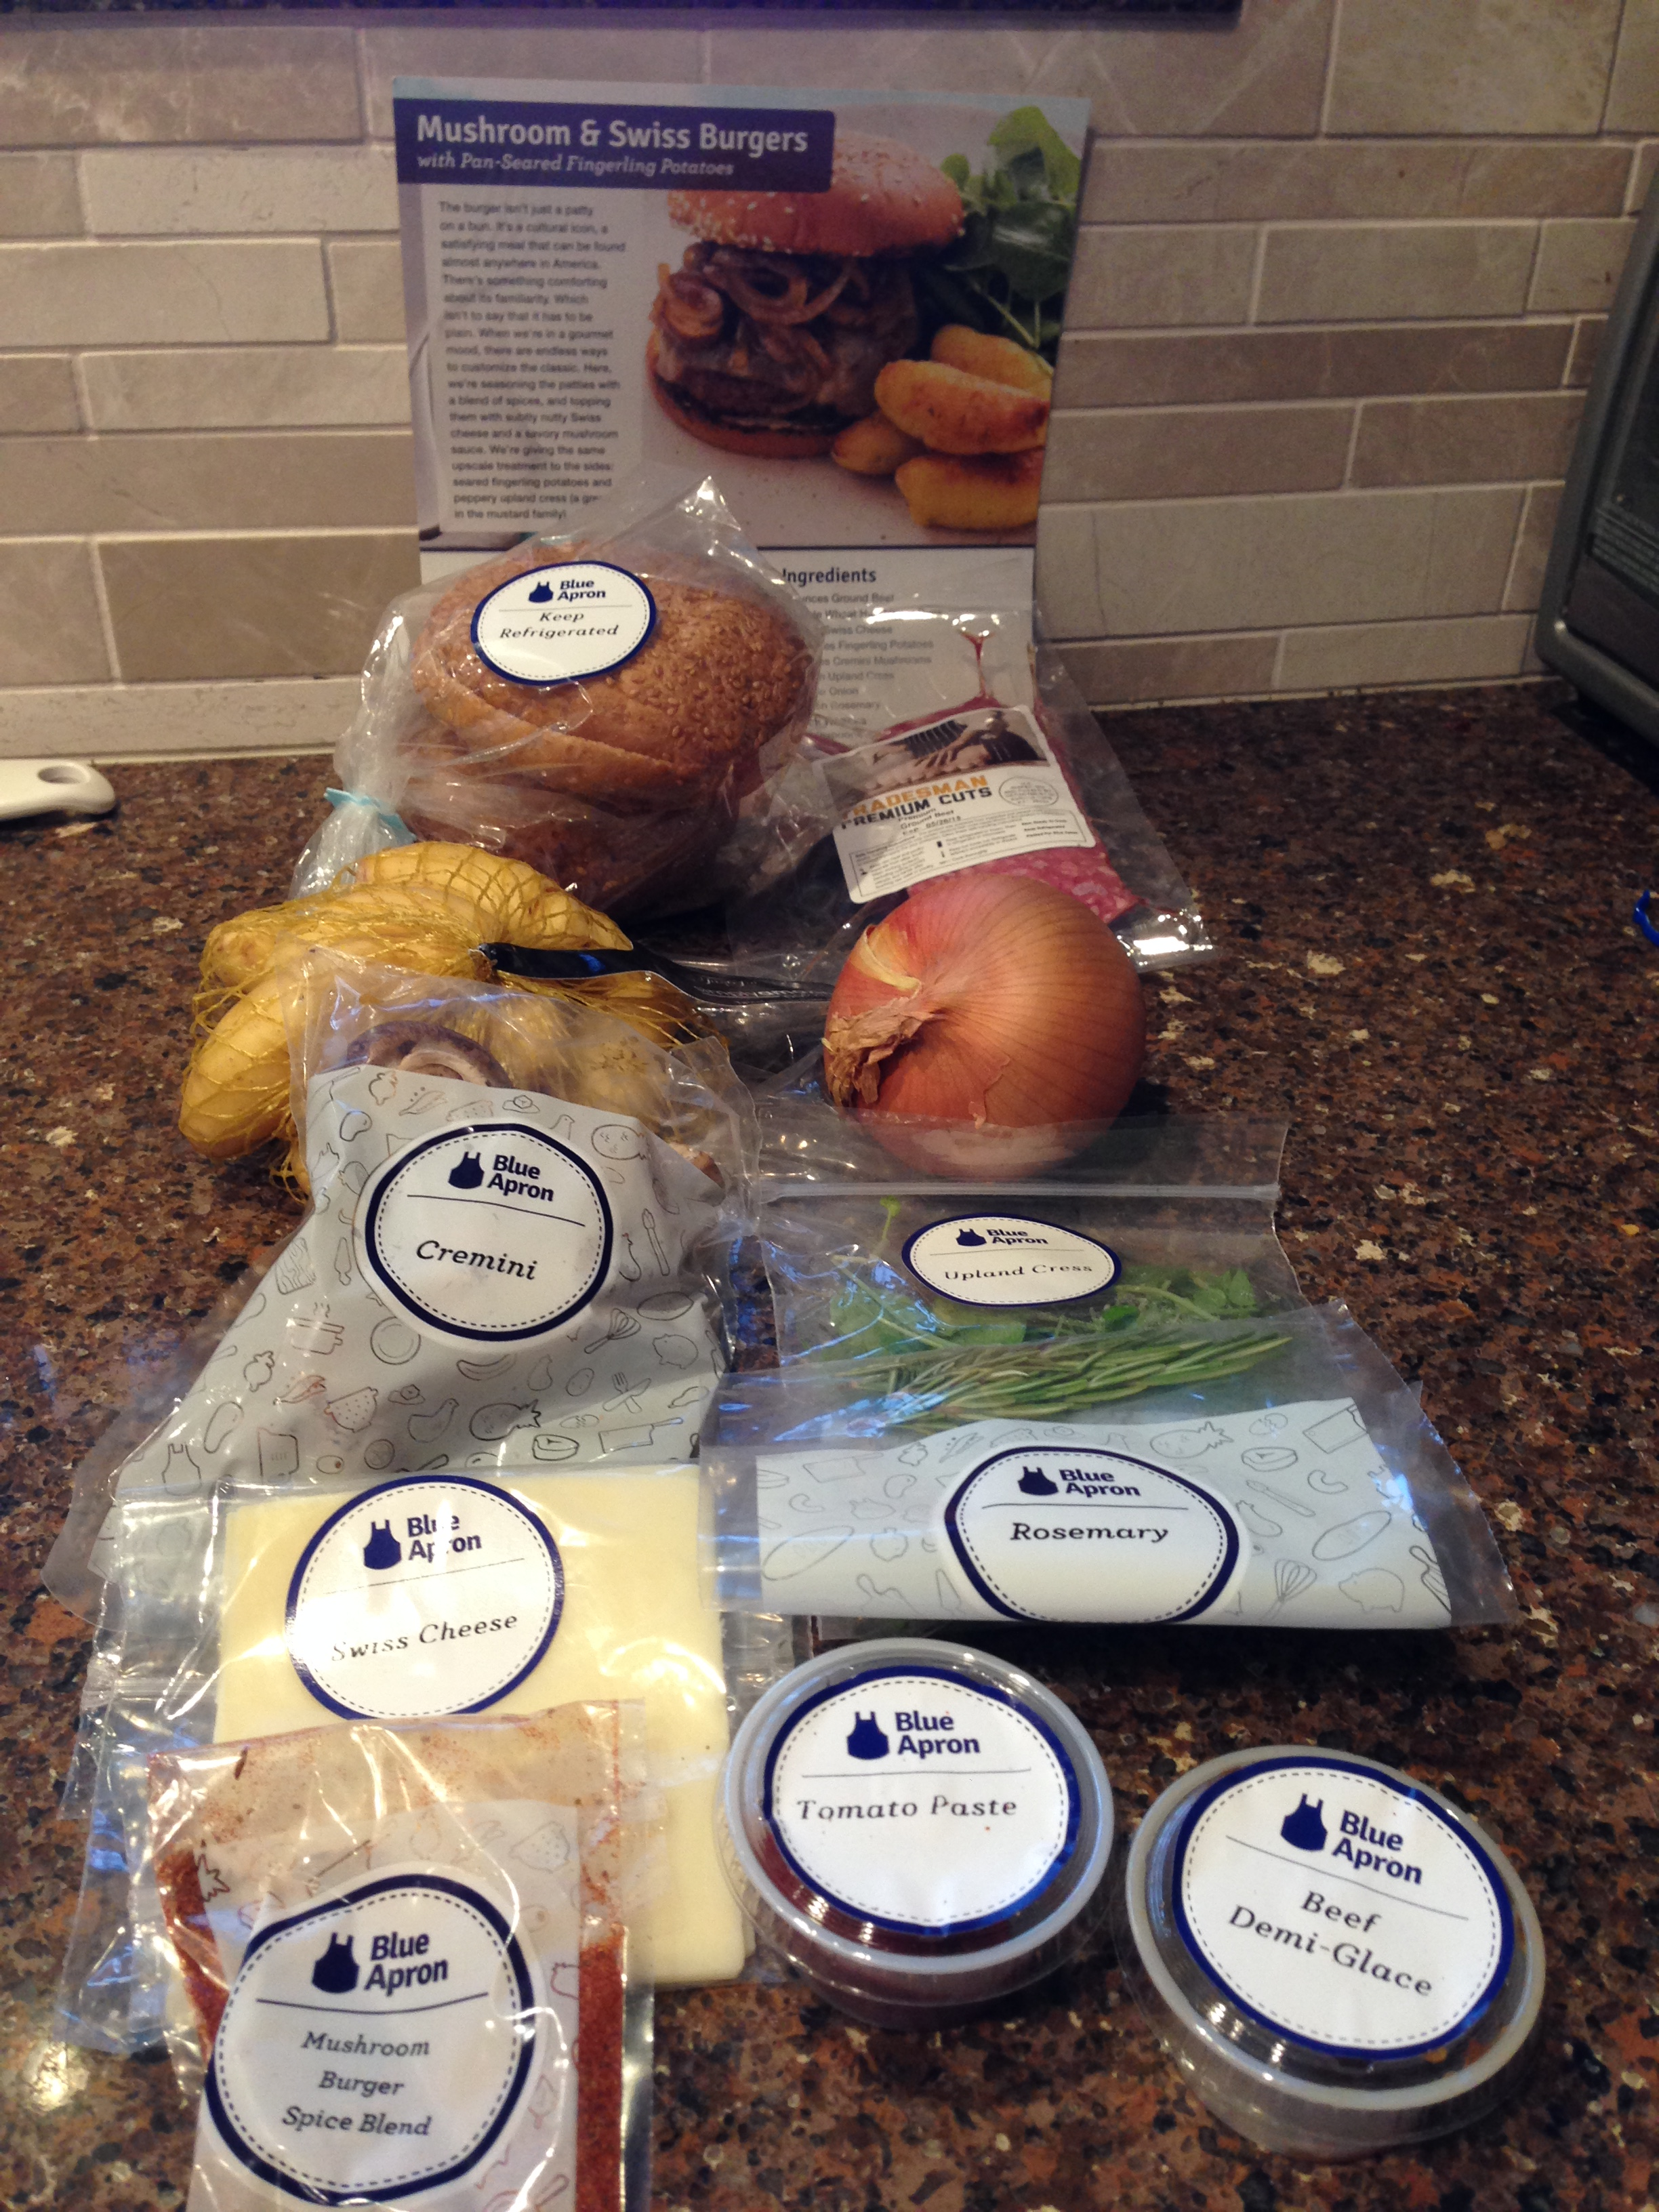 Blue apron zester - Mushroomswissburgers1